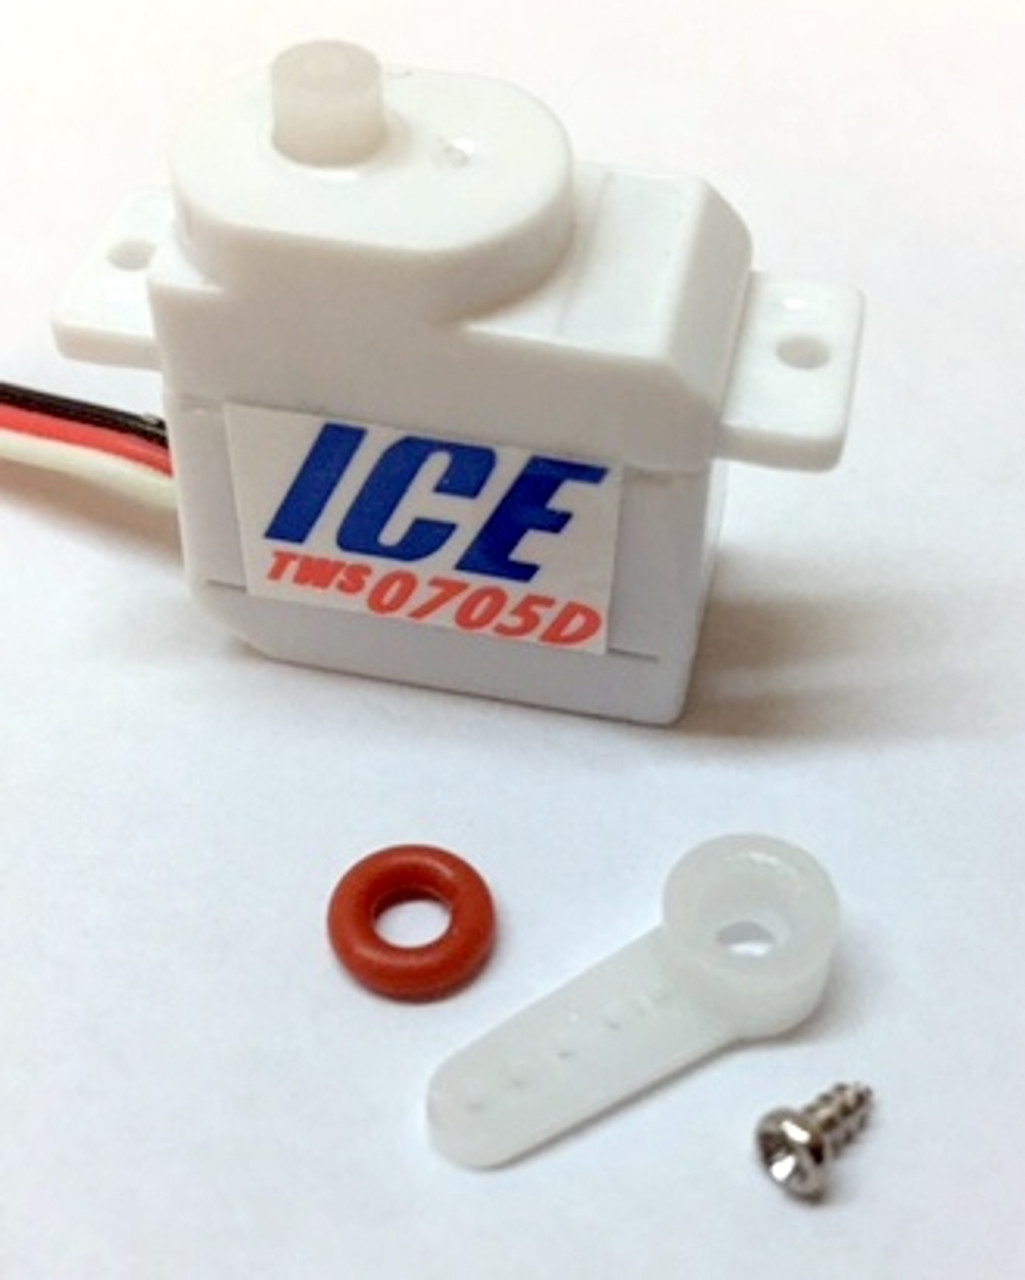 Servo control surface Flutter-Fix kit (4 pc's)